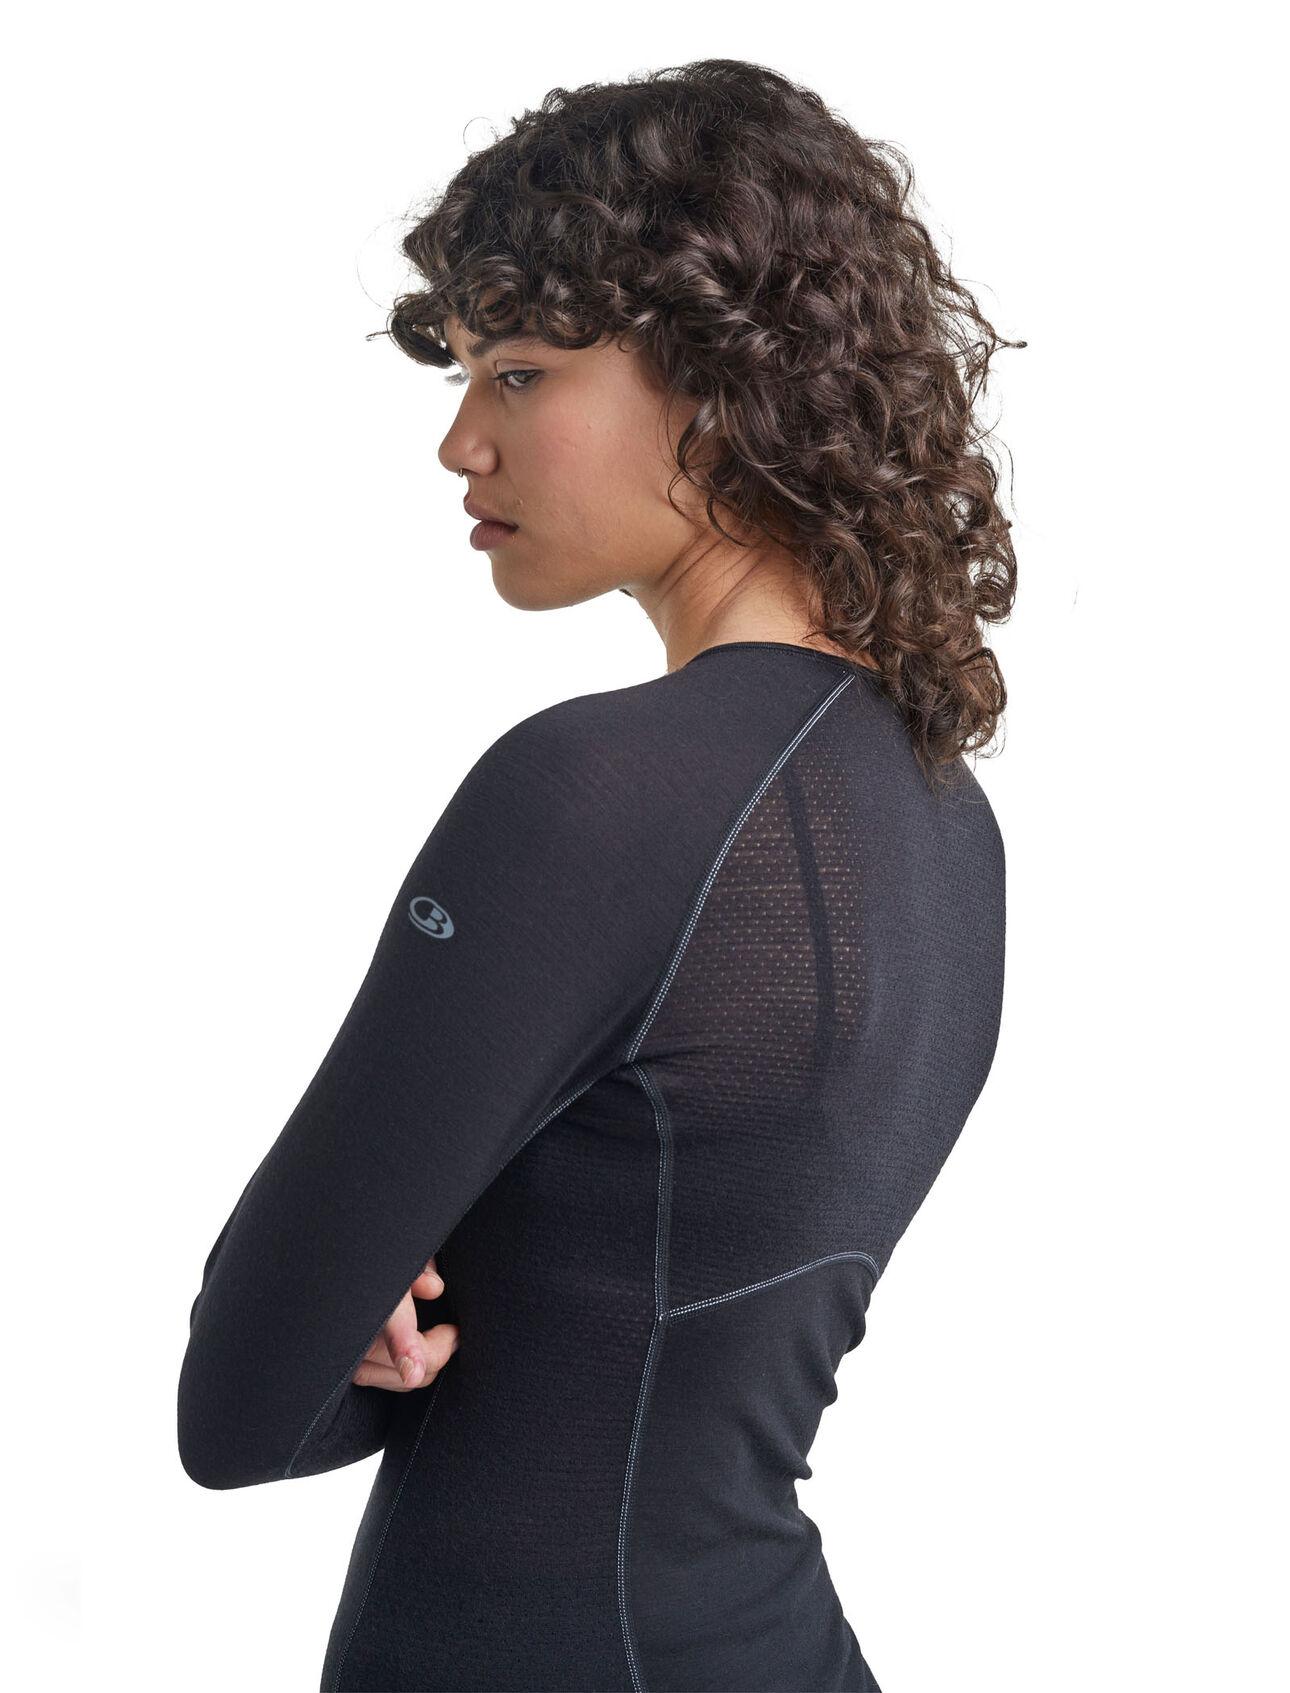 Details about  /Icebreaker Long Sleeve Shirt Mens bodyfitzone 200 Zone Merino Function Shirt funding show original title